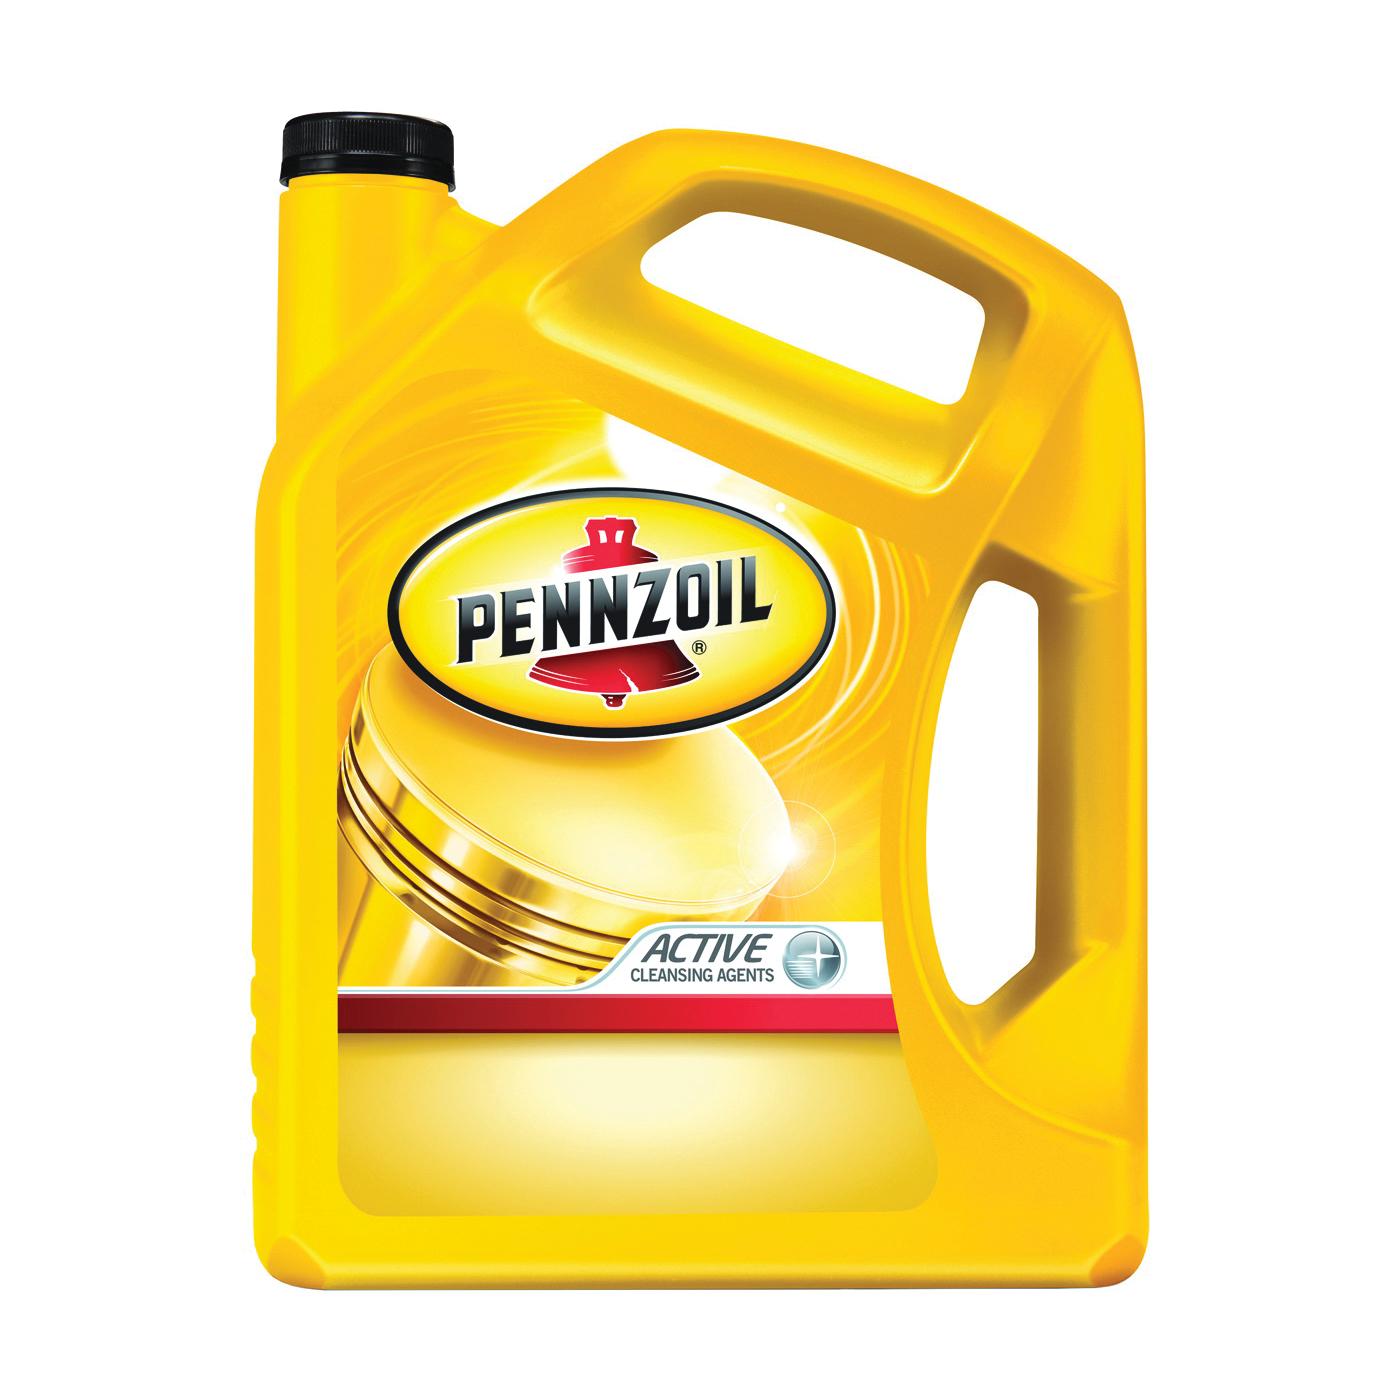 Picture of Pennzoil 550045210 Motor Oil, 5W-20, 5 qt Package, Bottle